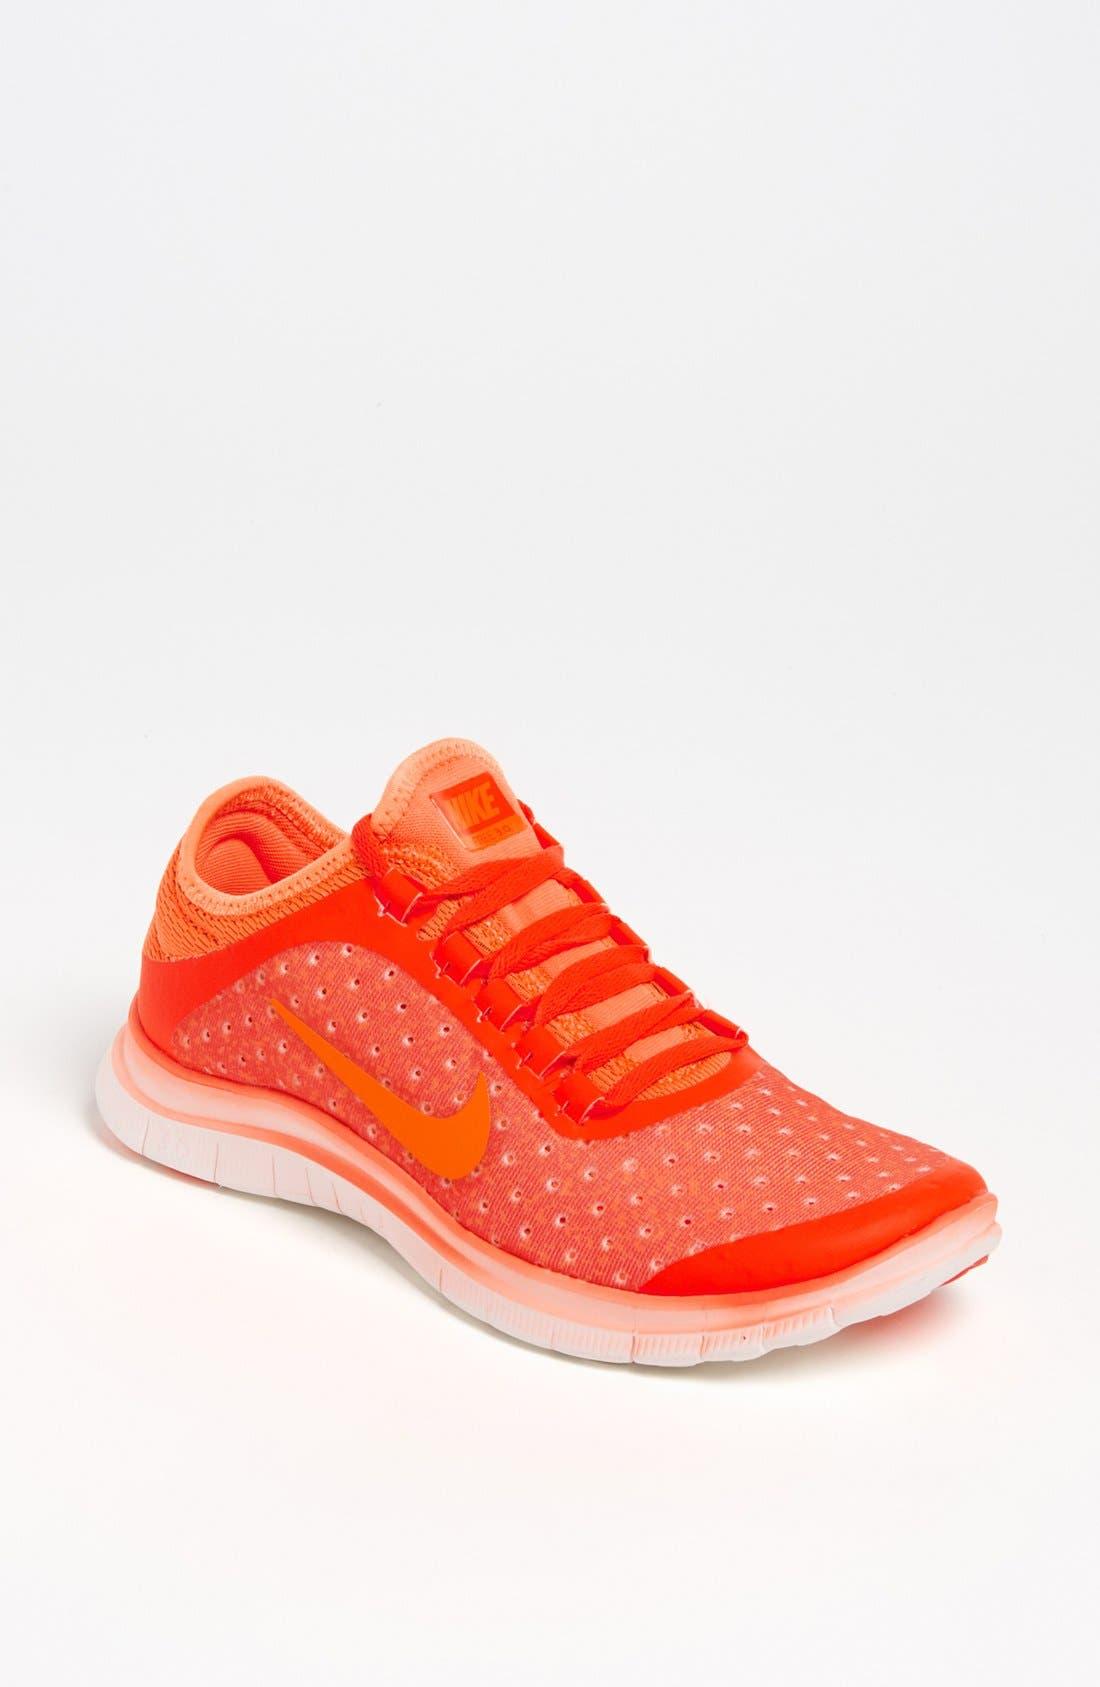 Main Image - Nike 'Free 3.0 v5' Sneaker (Women)